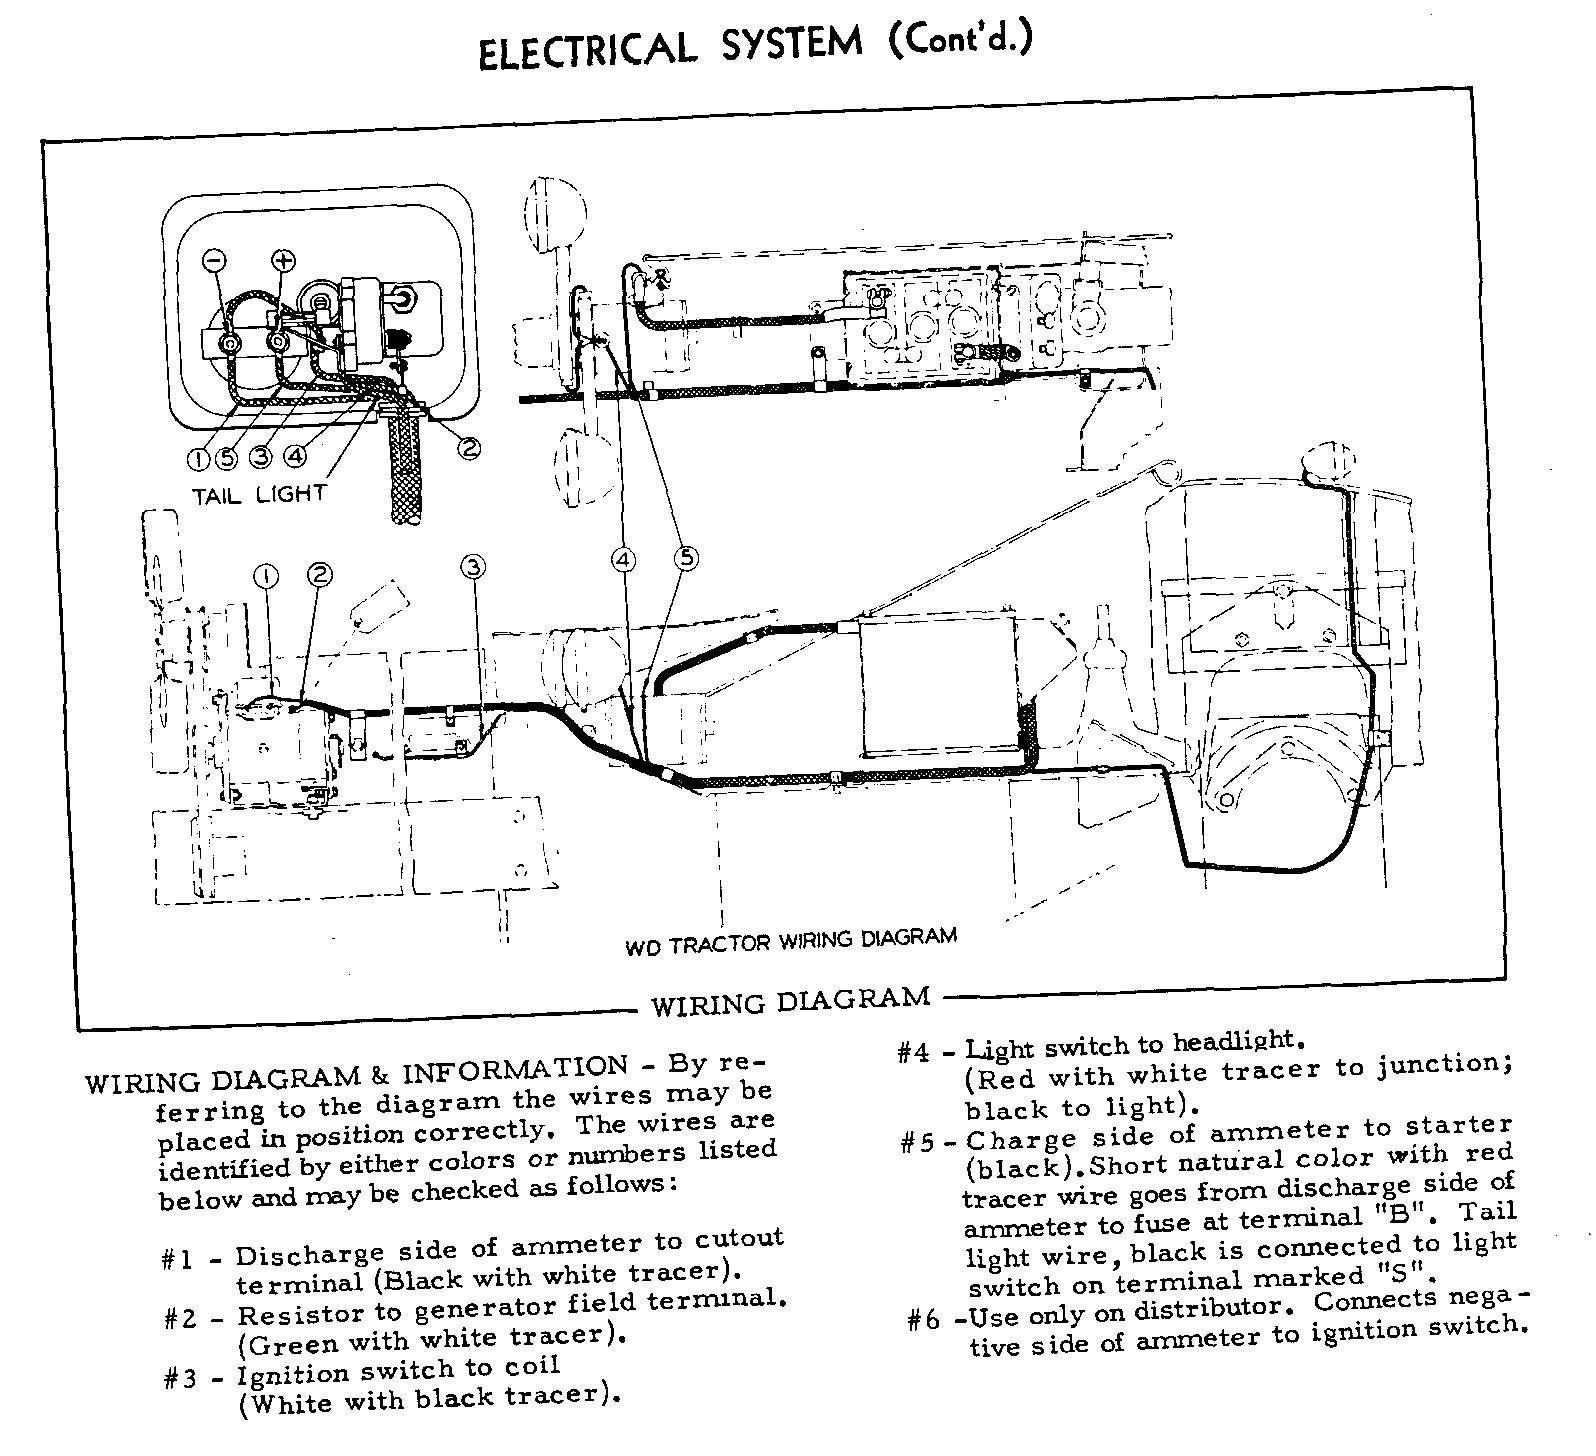 Diagram Of A Diesel Engine Universal Ignition Switch Wiring Diagram Elegant Engine Wiring Of Diagram Of A Diesel Engine